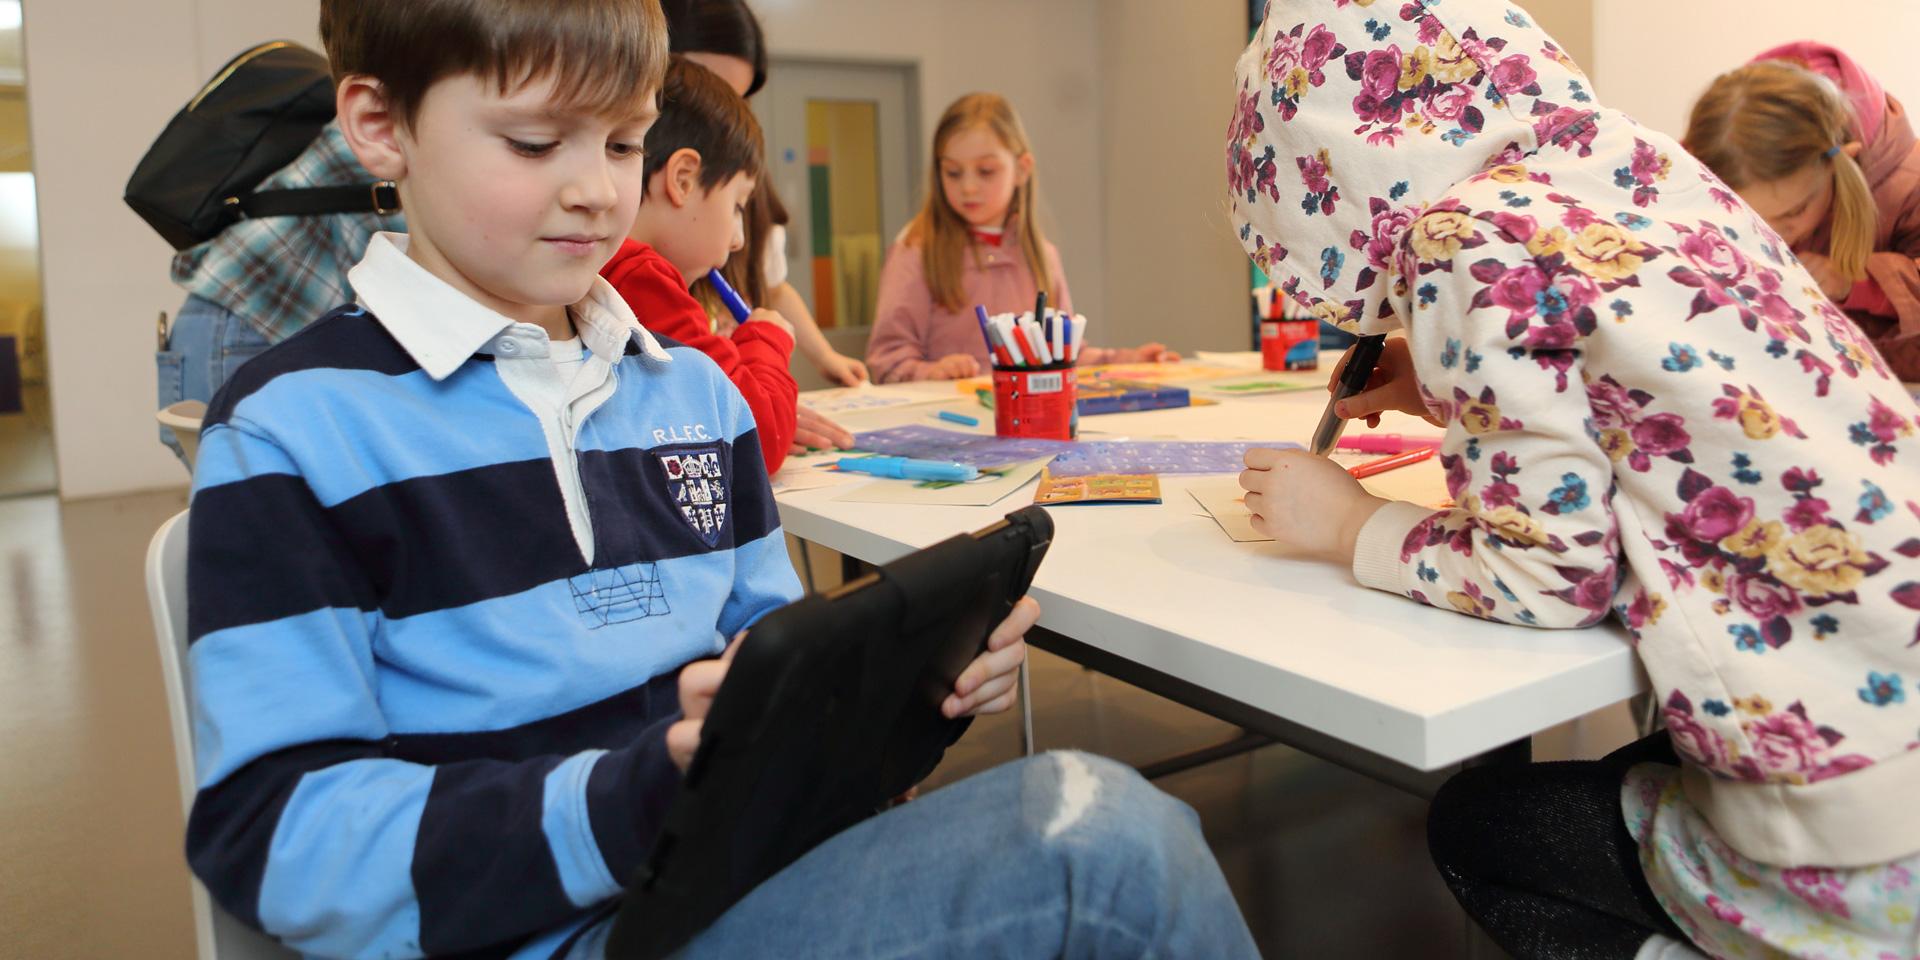 Children on iPads